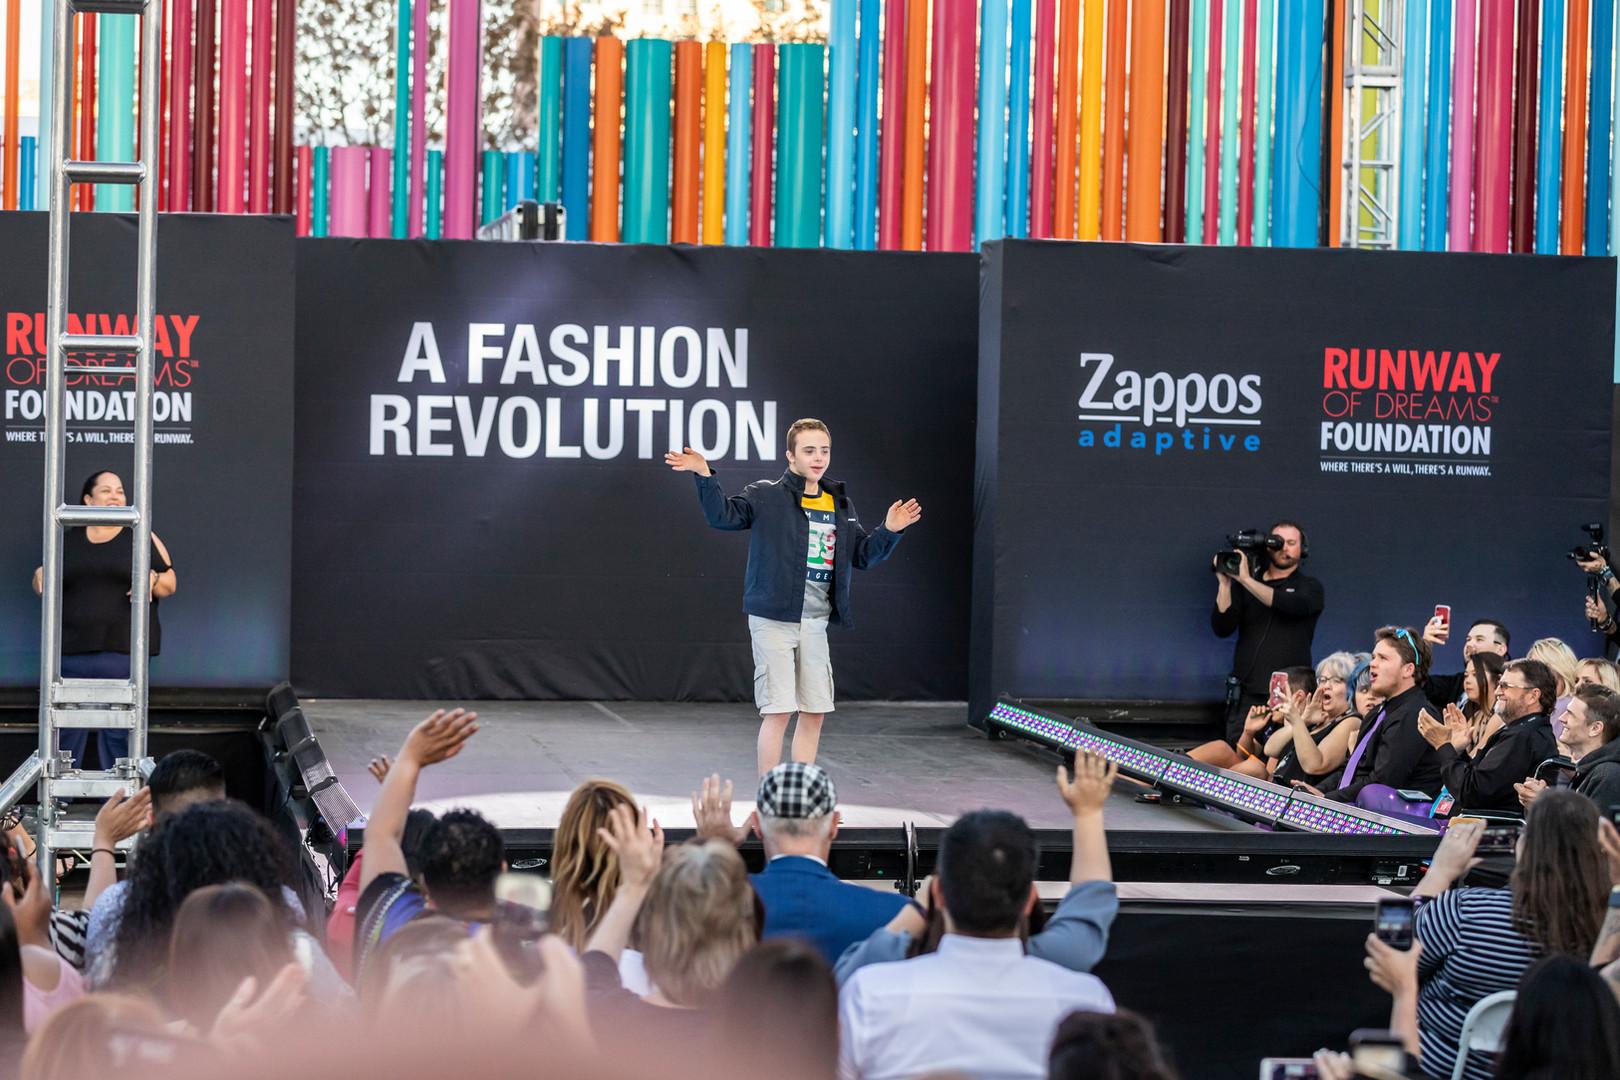 A Fashion Revolution Event, Runway of Dreams Foundation